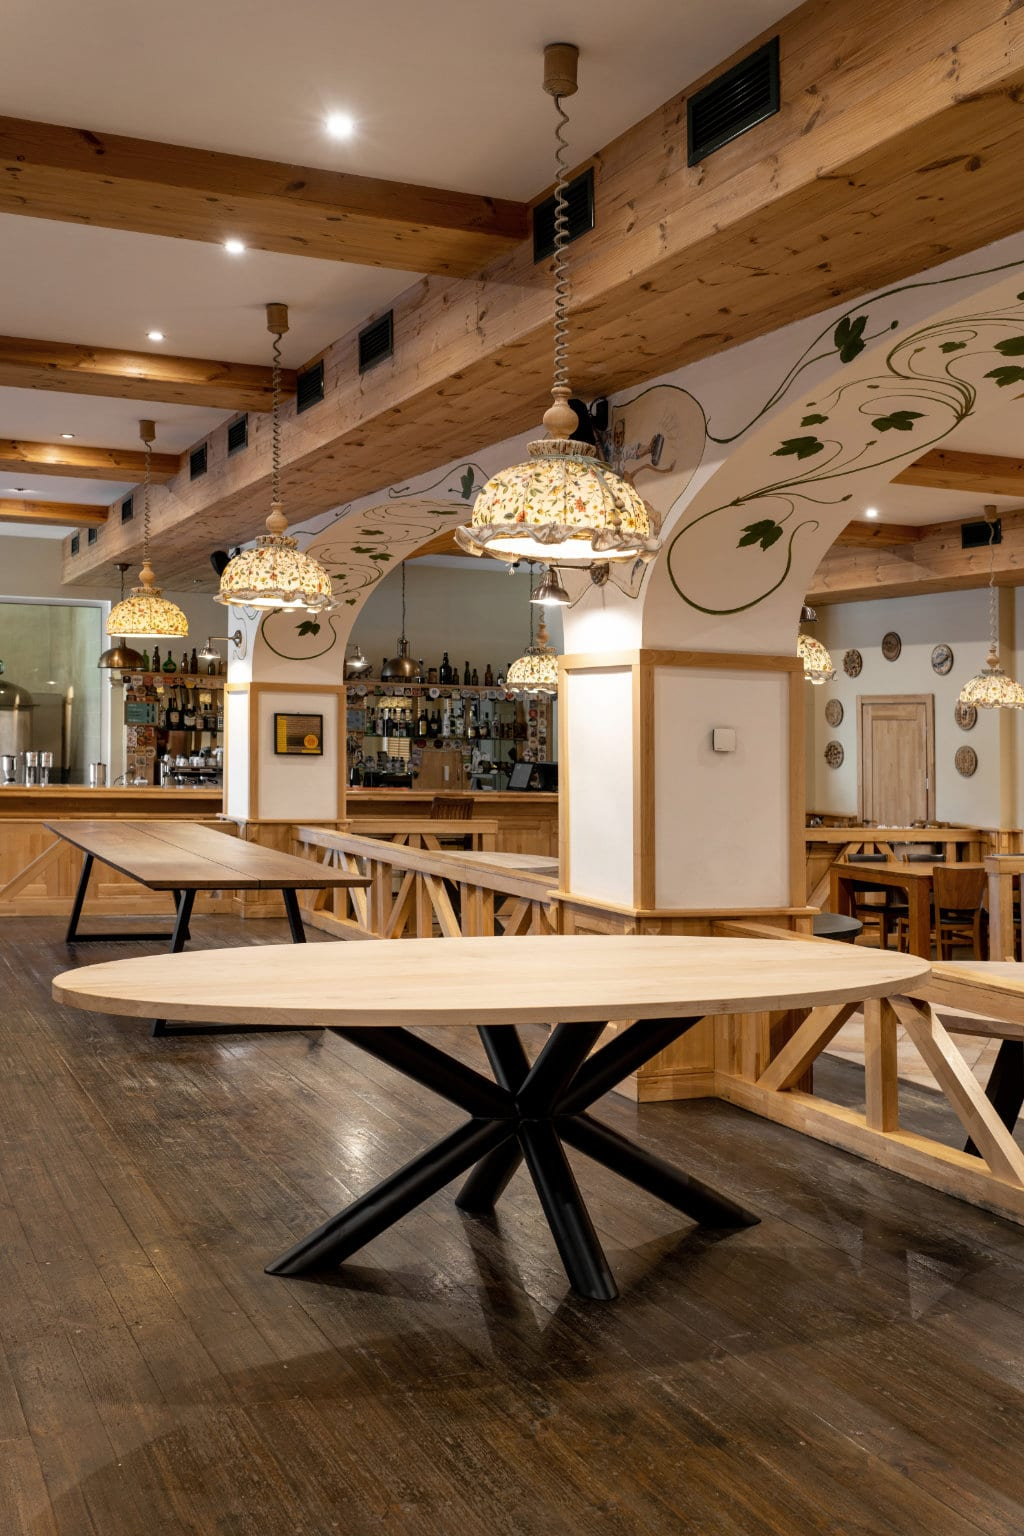 houten tafelblad rond